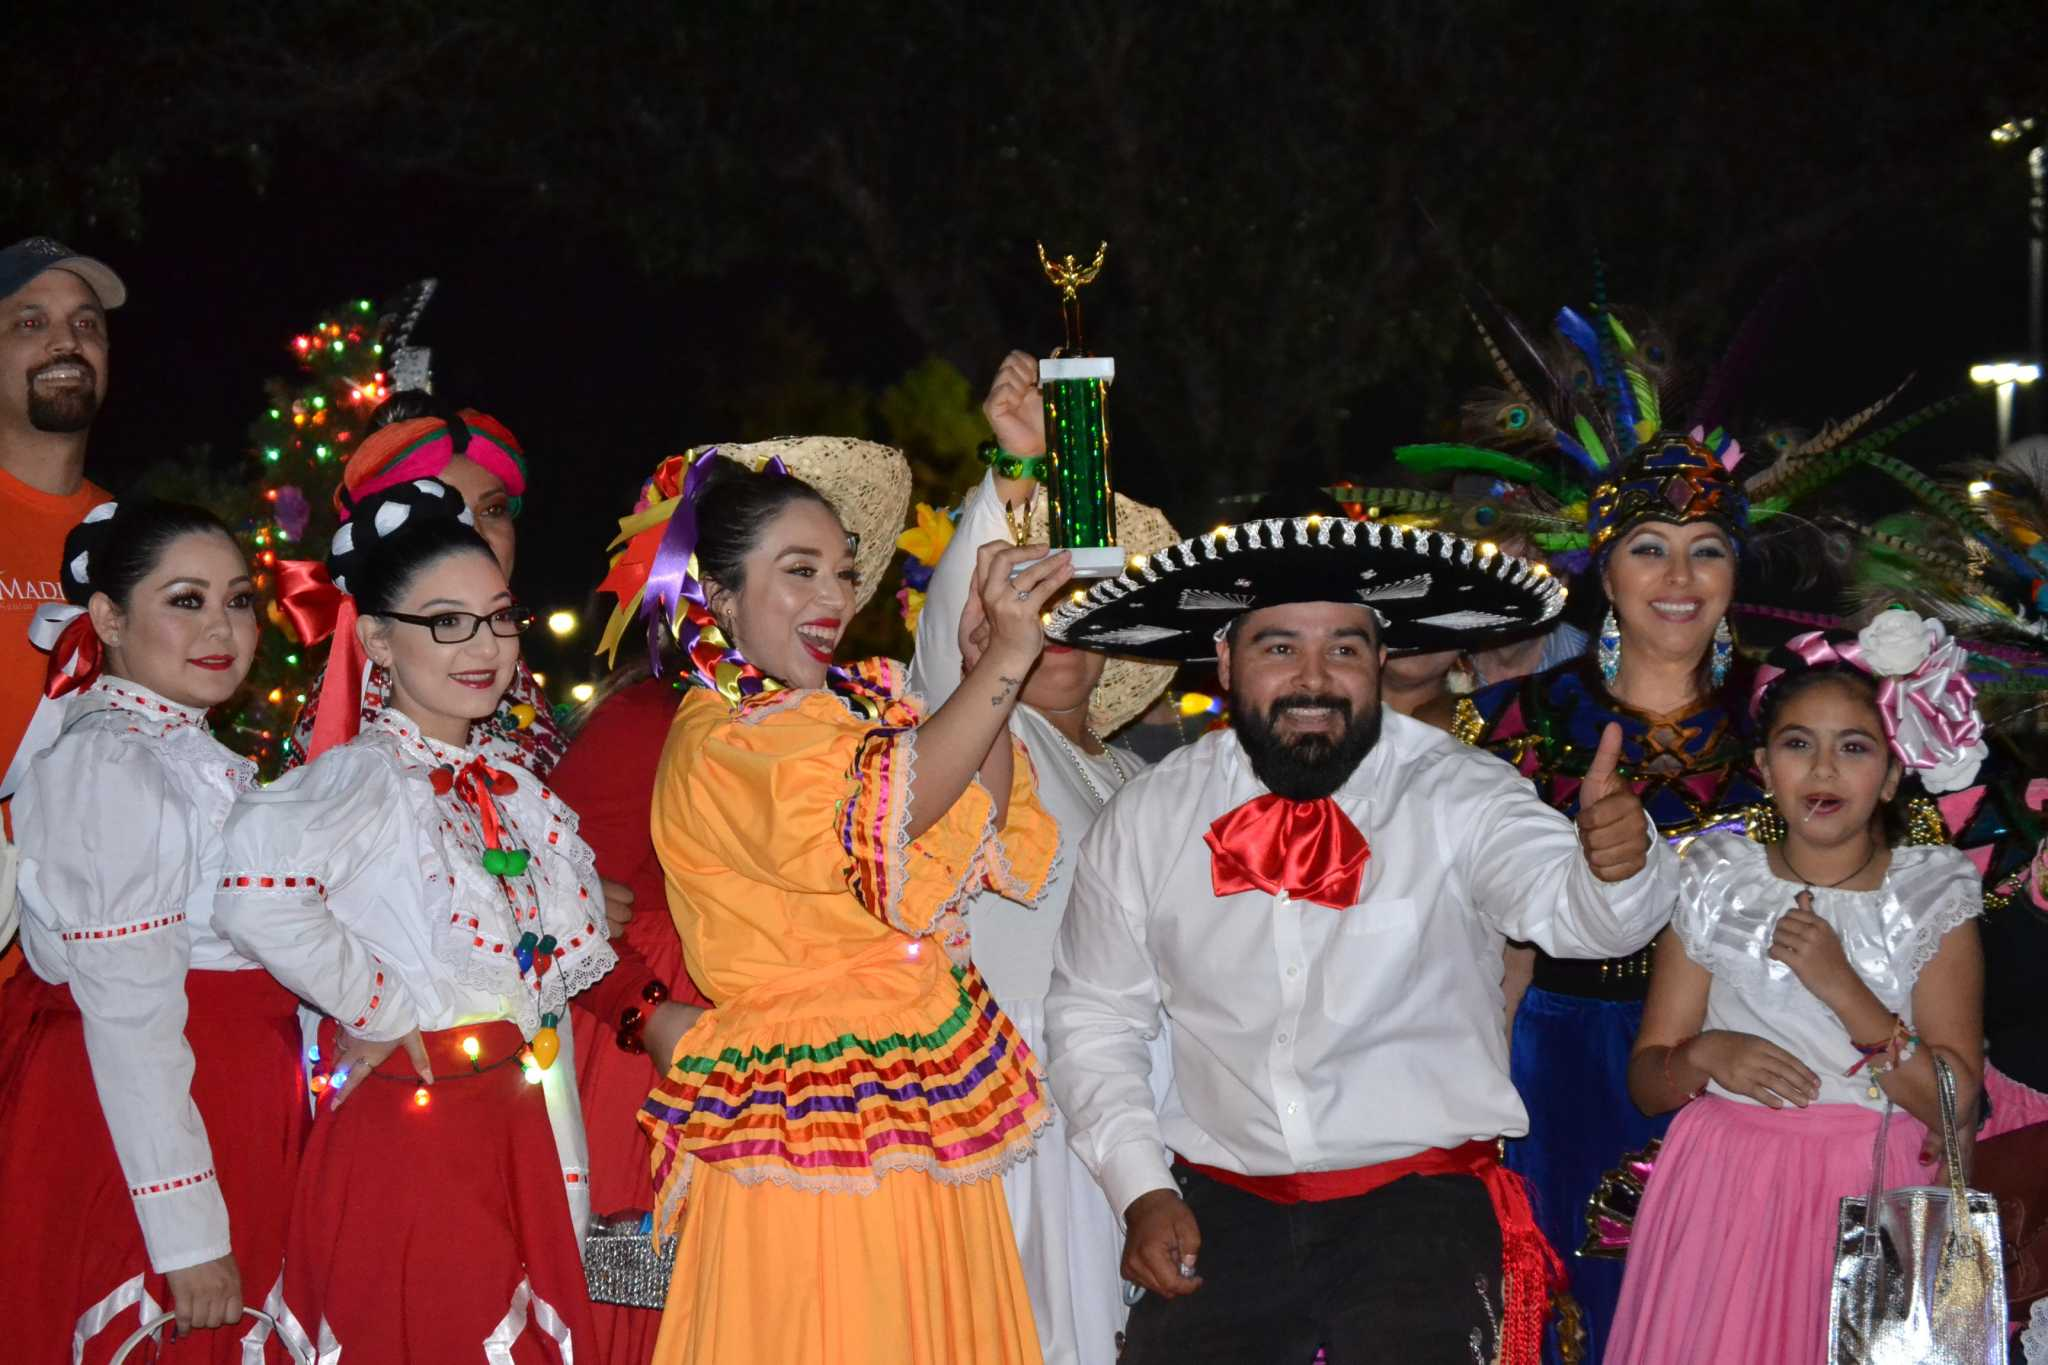 Pasadena display, tree lighting, parade to usher in holidays